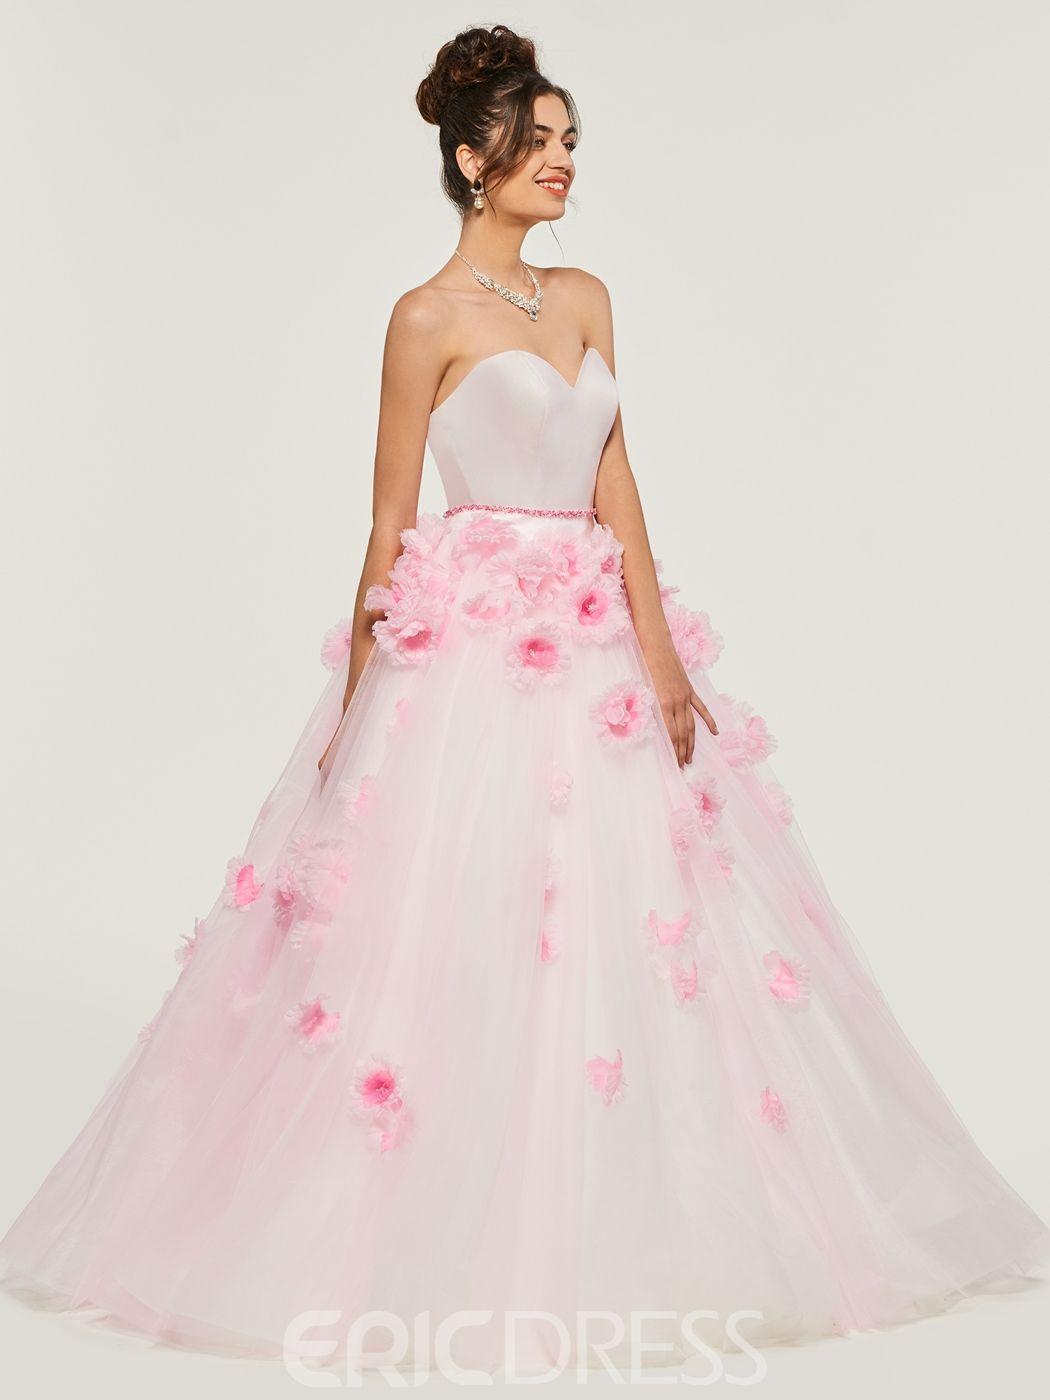 ericdress Schatz Applique Ball Quinceanera Kleid | Kleider ...